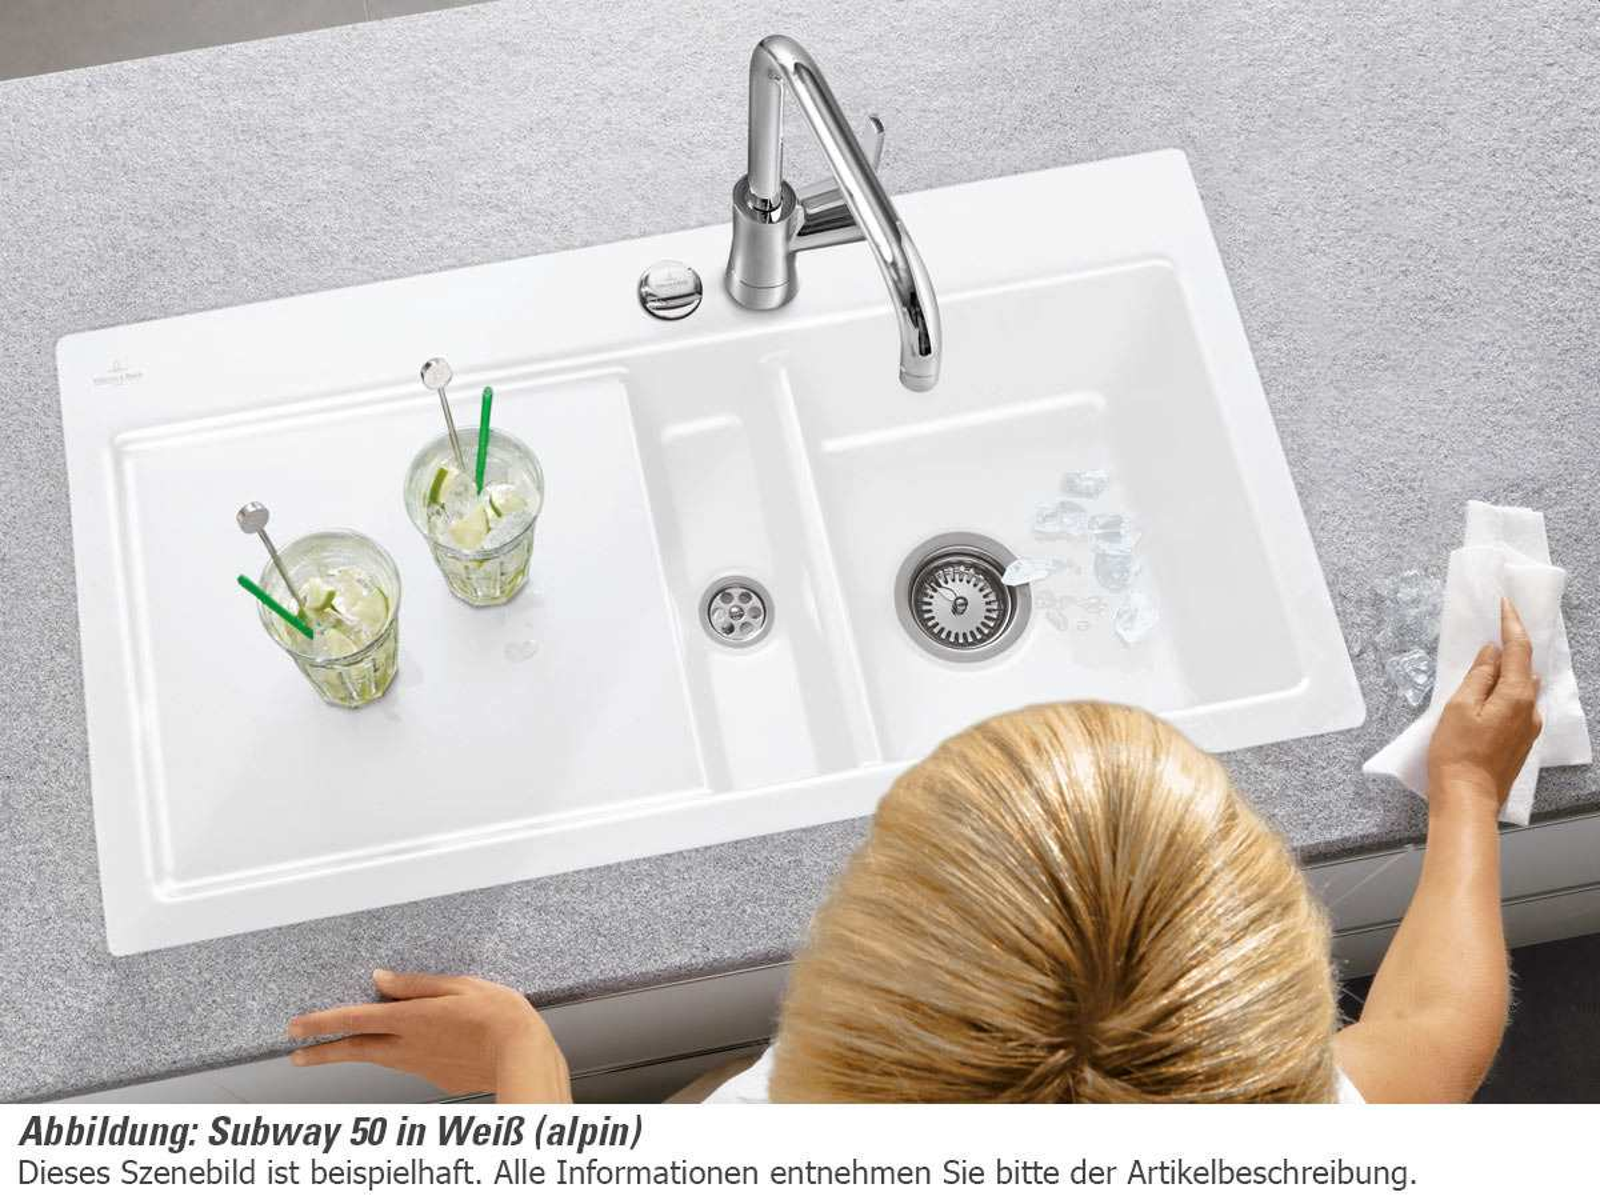 villeroy boch subway 50 white pearl keramik sp lbecken muster wei sp le k che. Black Bedroom Furniture Sets. Home Design Ideas